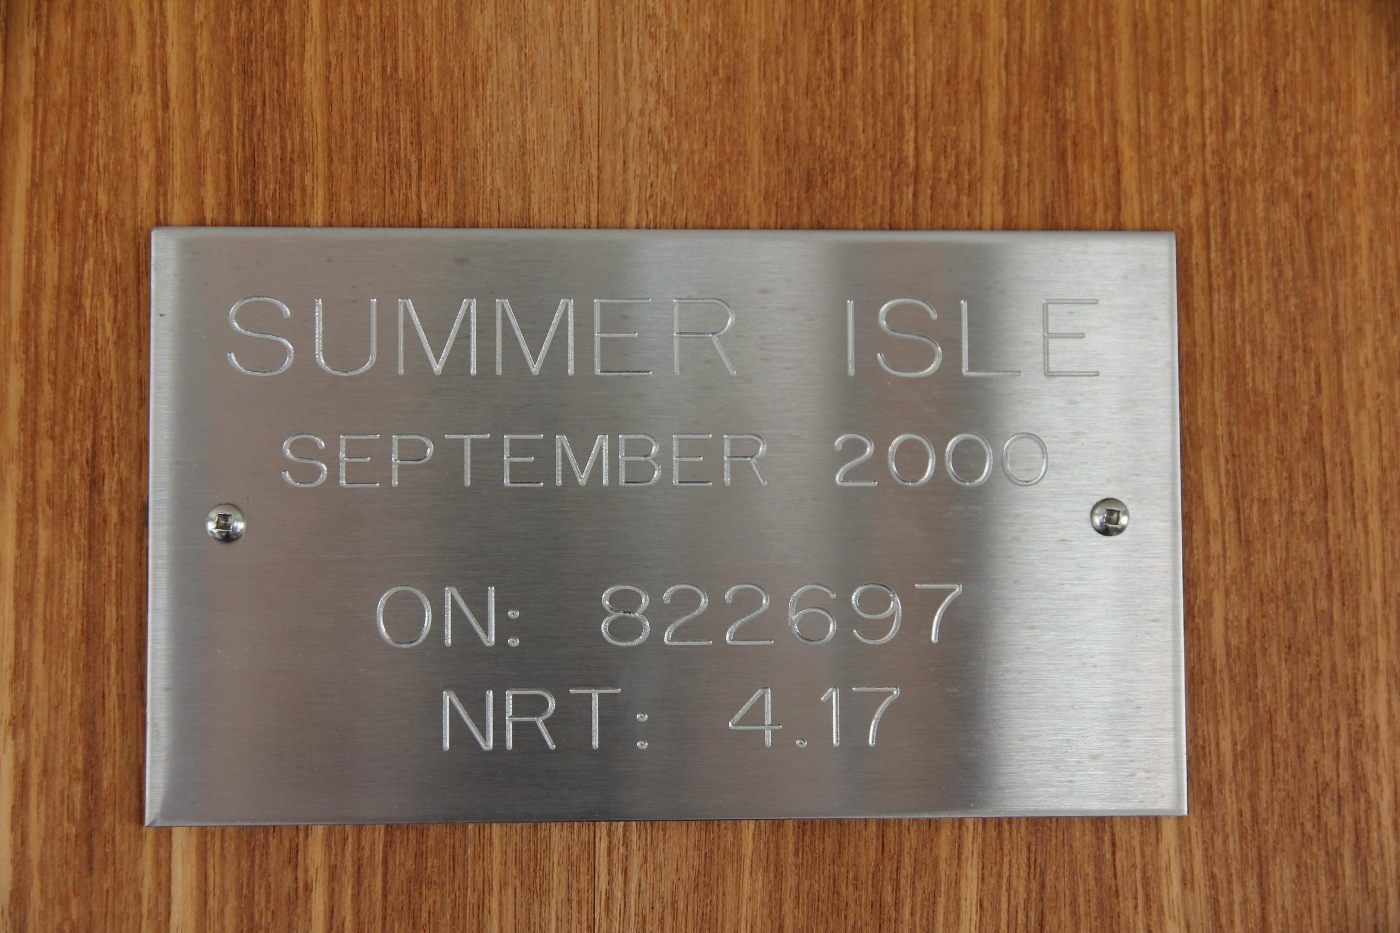 2001 Nordic Tugs 32 Pilothouse, Vessel Nameplate